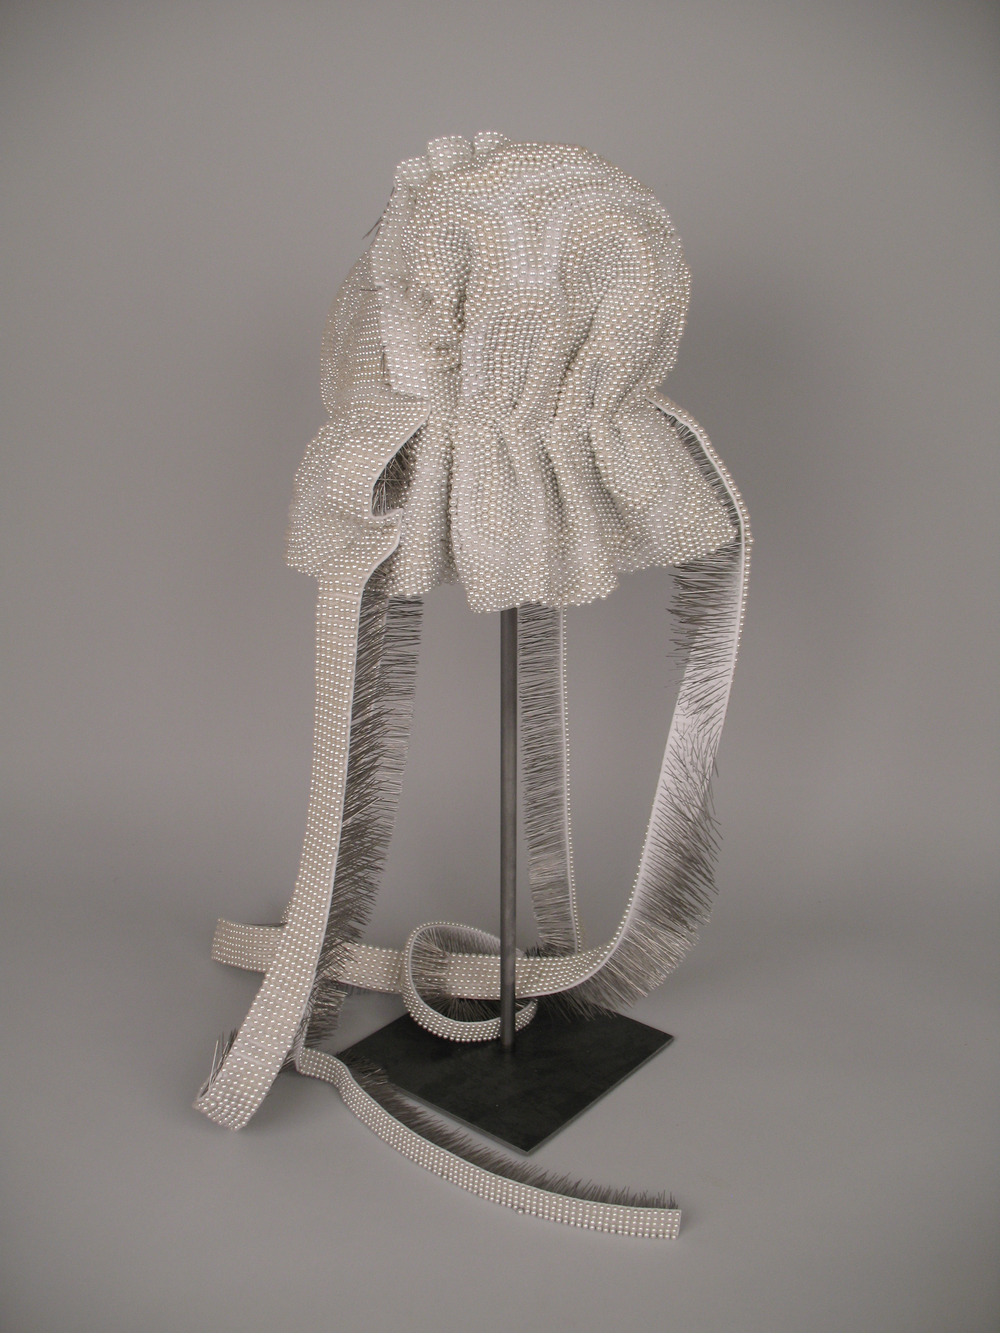 "Seer Bonnet XVI (detail) 16,194 pearl corsage pins, fabric, steel, 29"" x 12.5"" x 13.5"", 2010-2011"